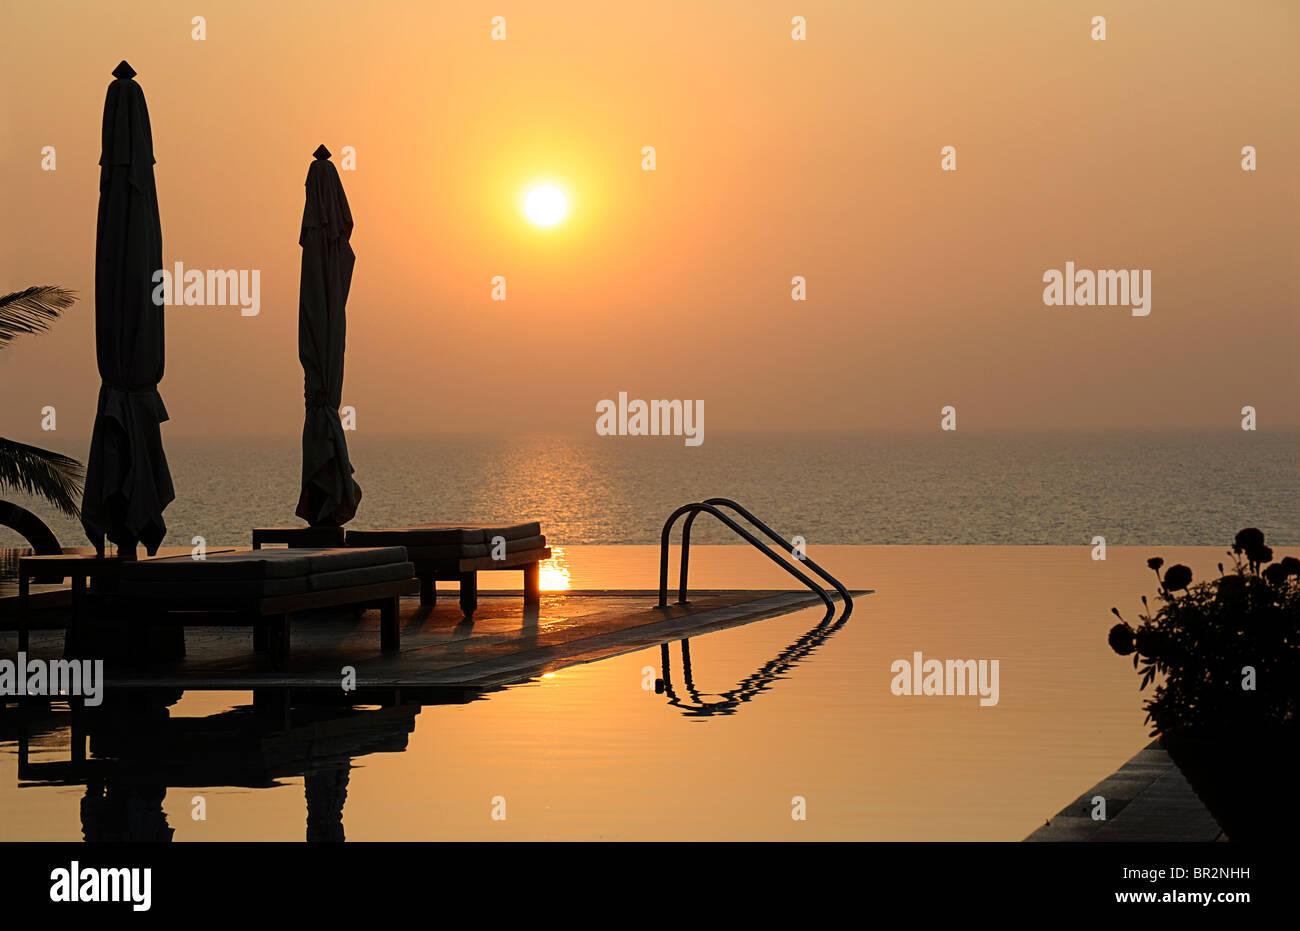 Hotel piscina infinity al tramonto, Kovalam, Kerala, India Immagini Stock